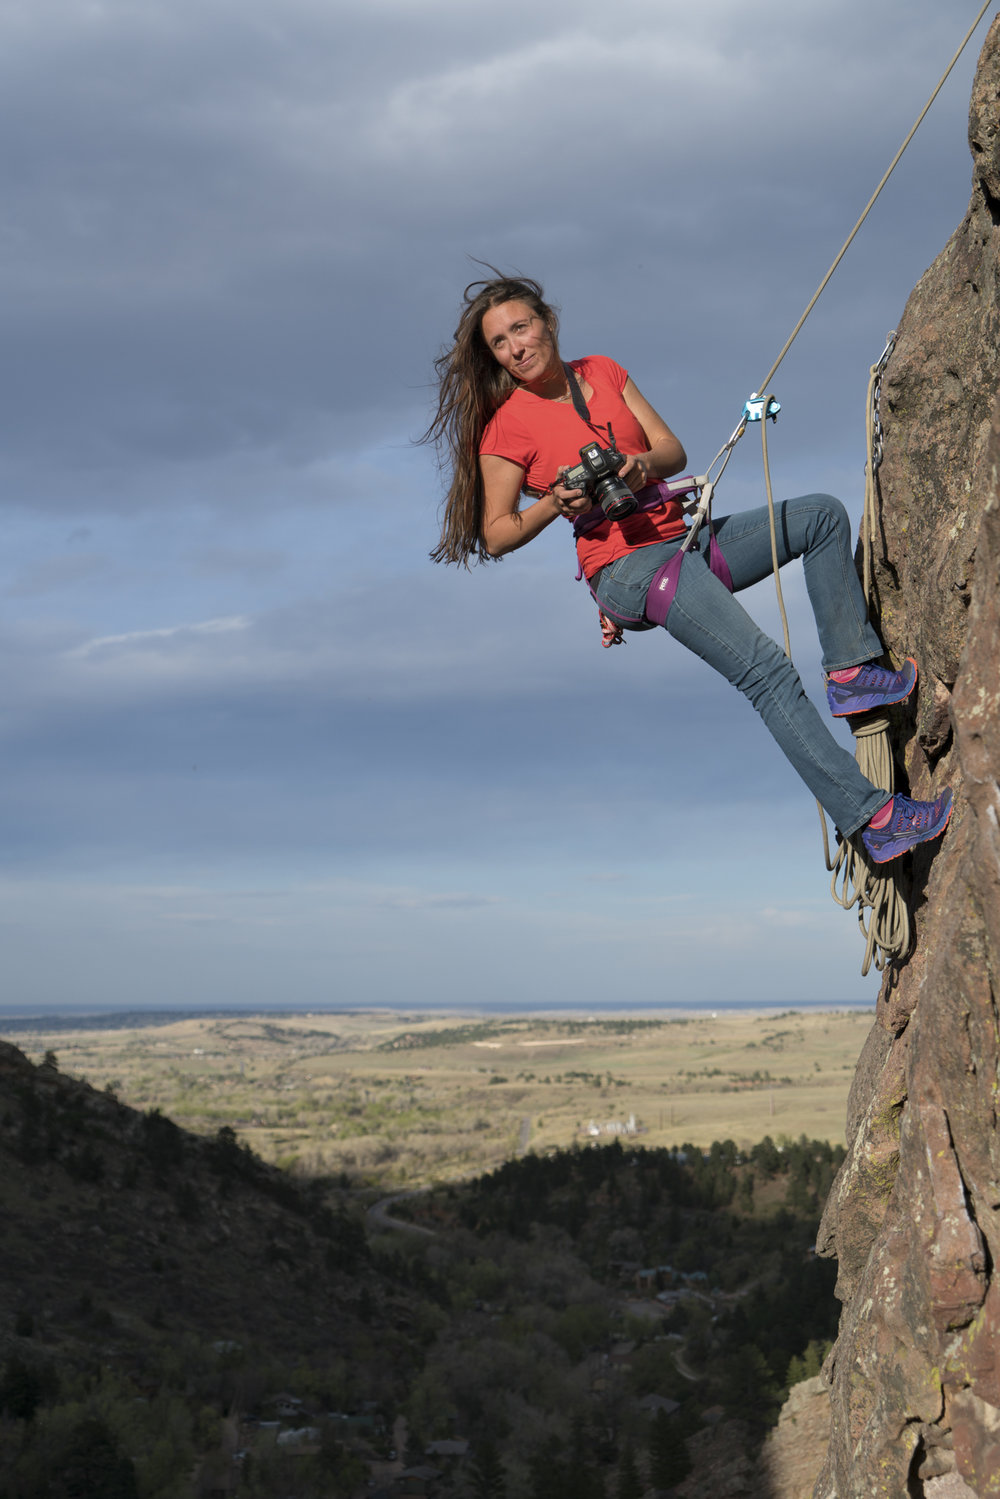 Krystal WrightAdventure Sports Photographer -